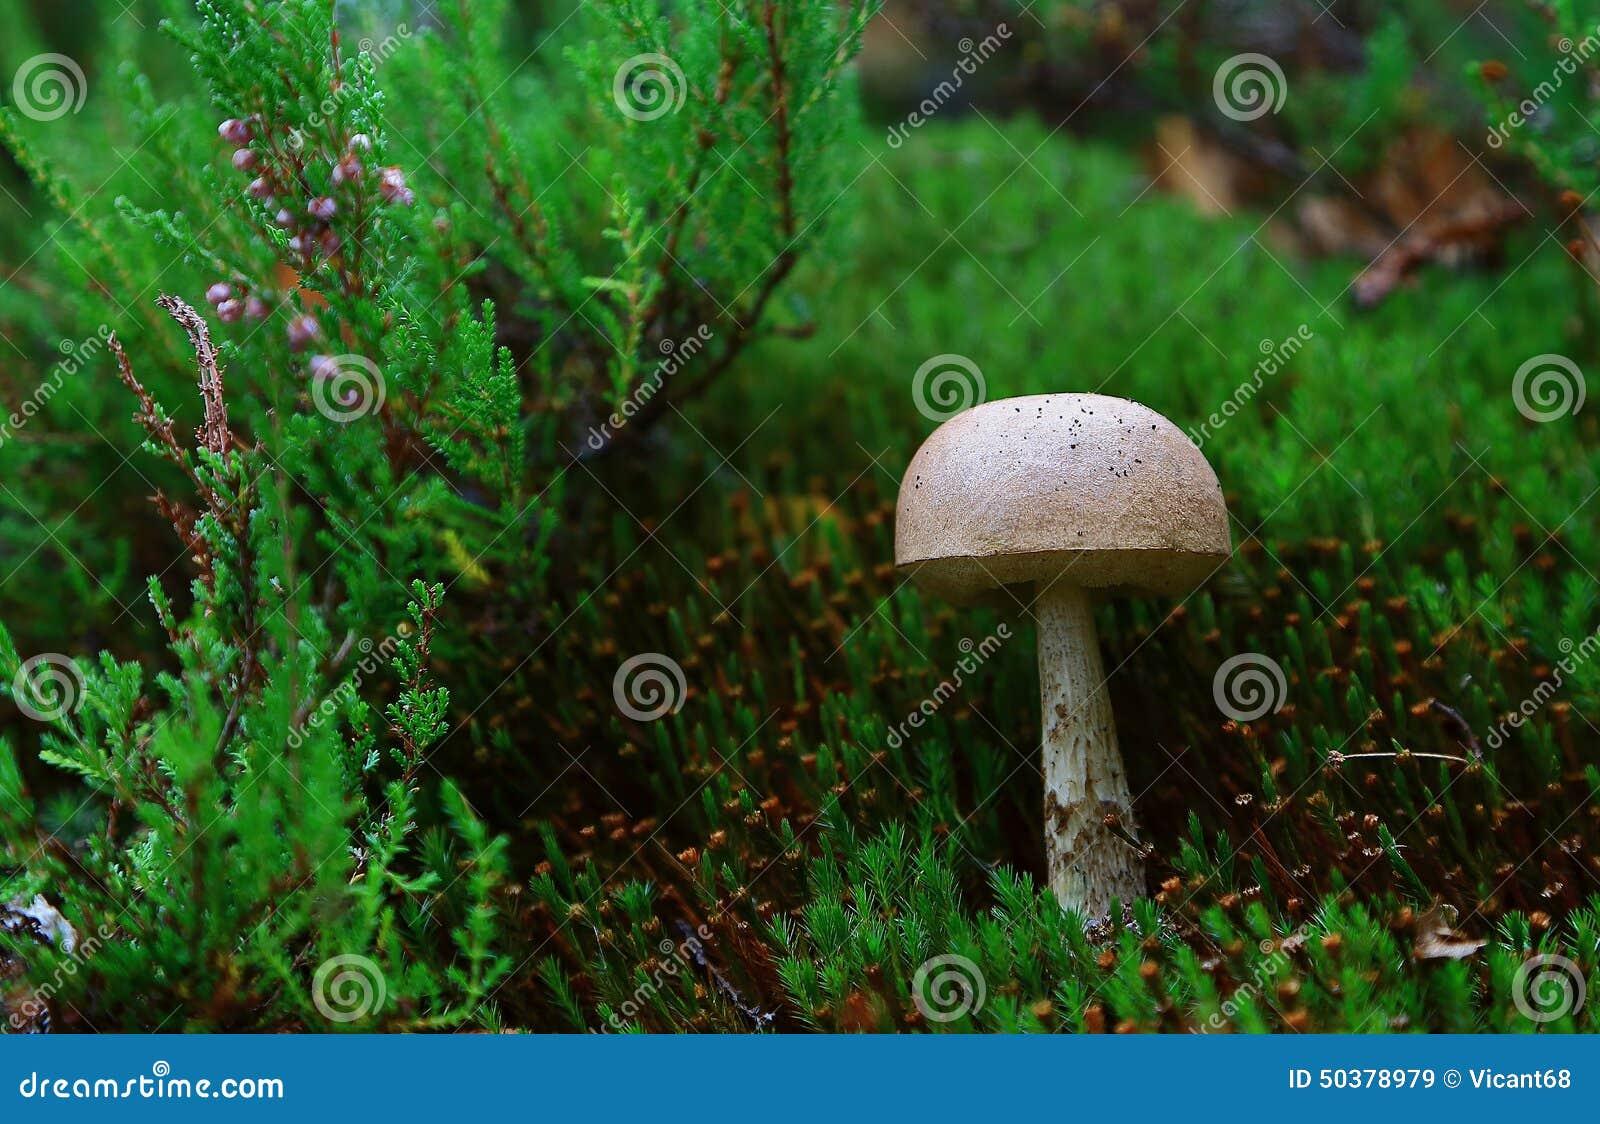 Is moss a fungus?